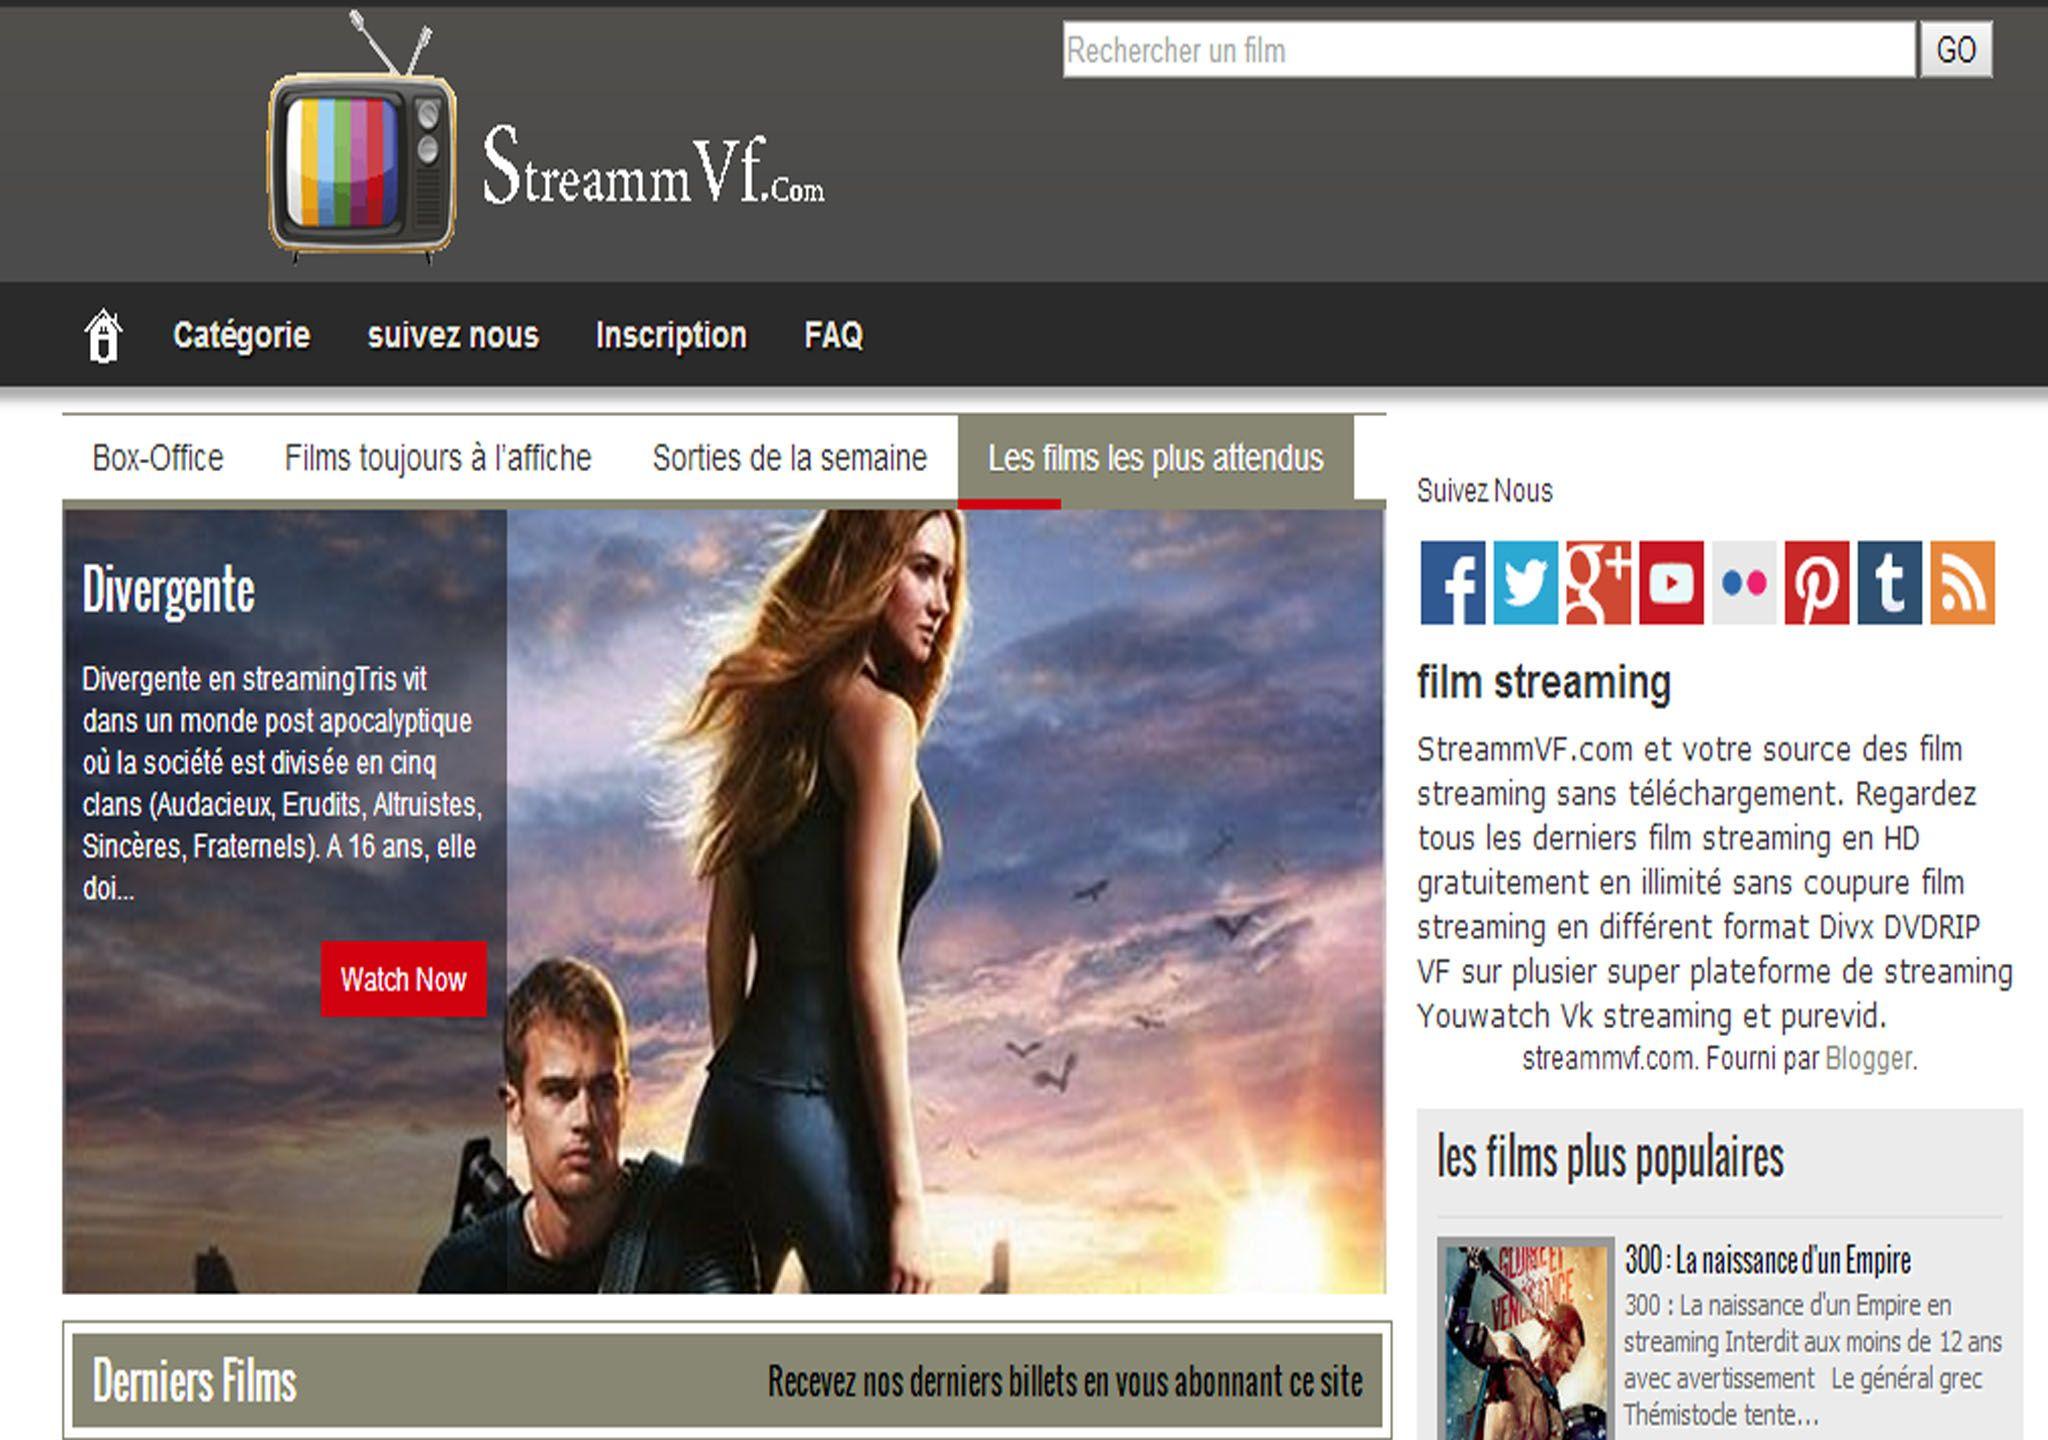 film streaming, vf streaming, vk streaming, streammvf, youwatch streaming,  youwatch streaming, films, streaming, gratuit, film en streaming, voir film